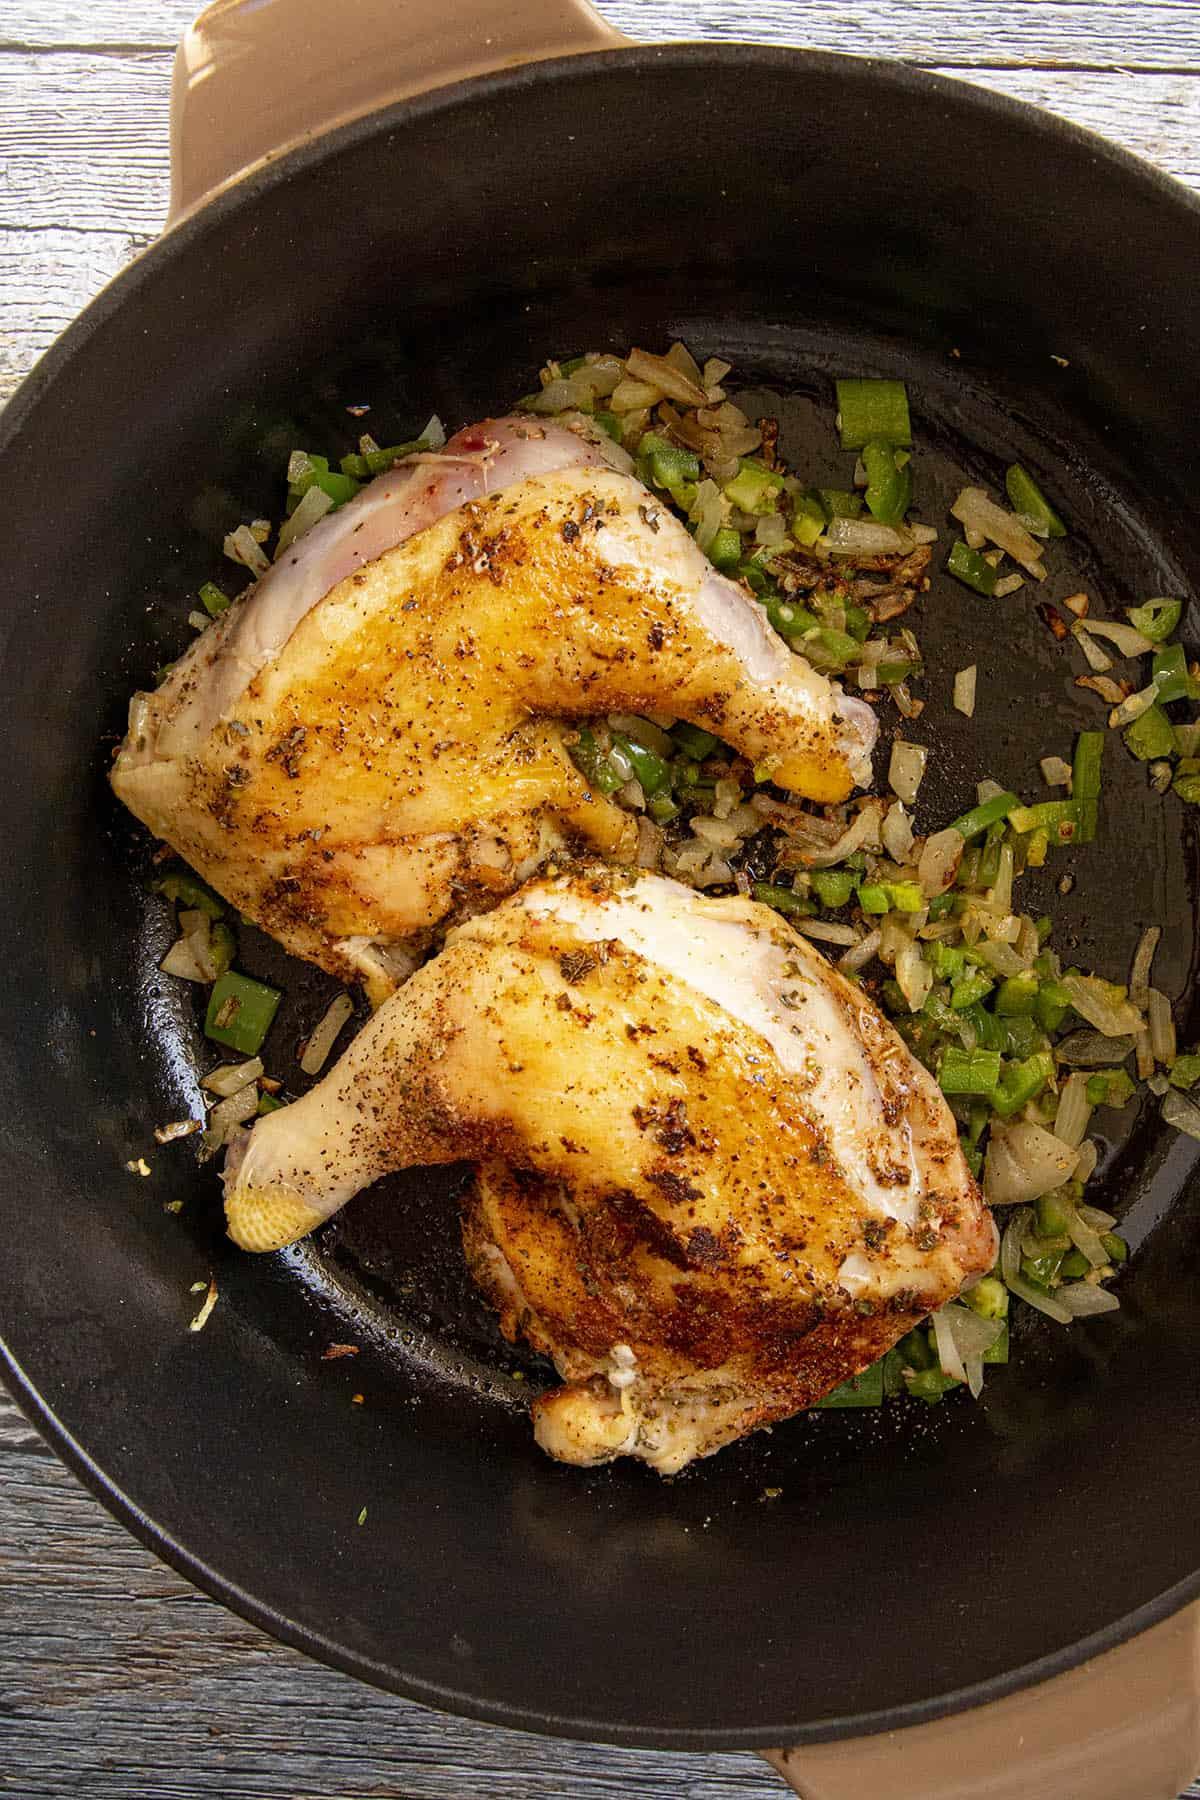 Seared chicken to make chicken mole